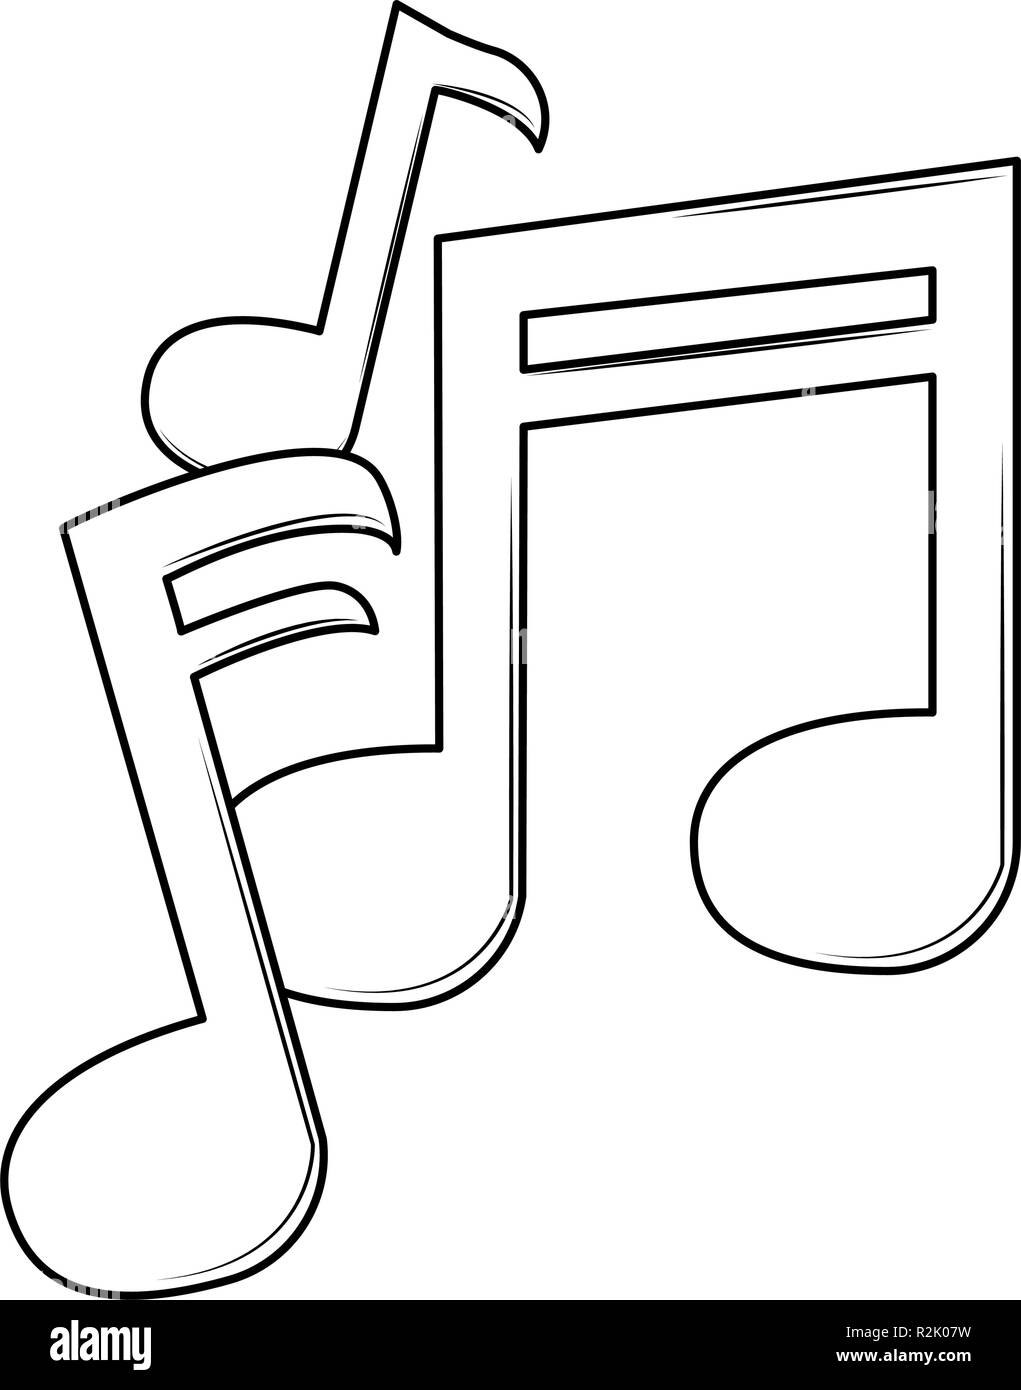 Cartoon Notes : cartoon, notes, Music, Notes, Cartoon, Black, White, Vector, Illustration, Graphic, Design, Stock, Image, Alamy